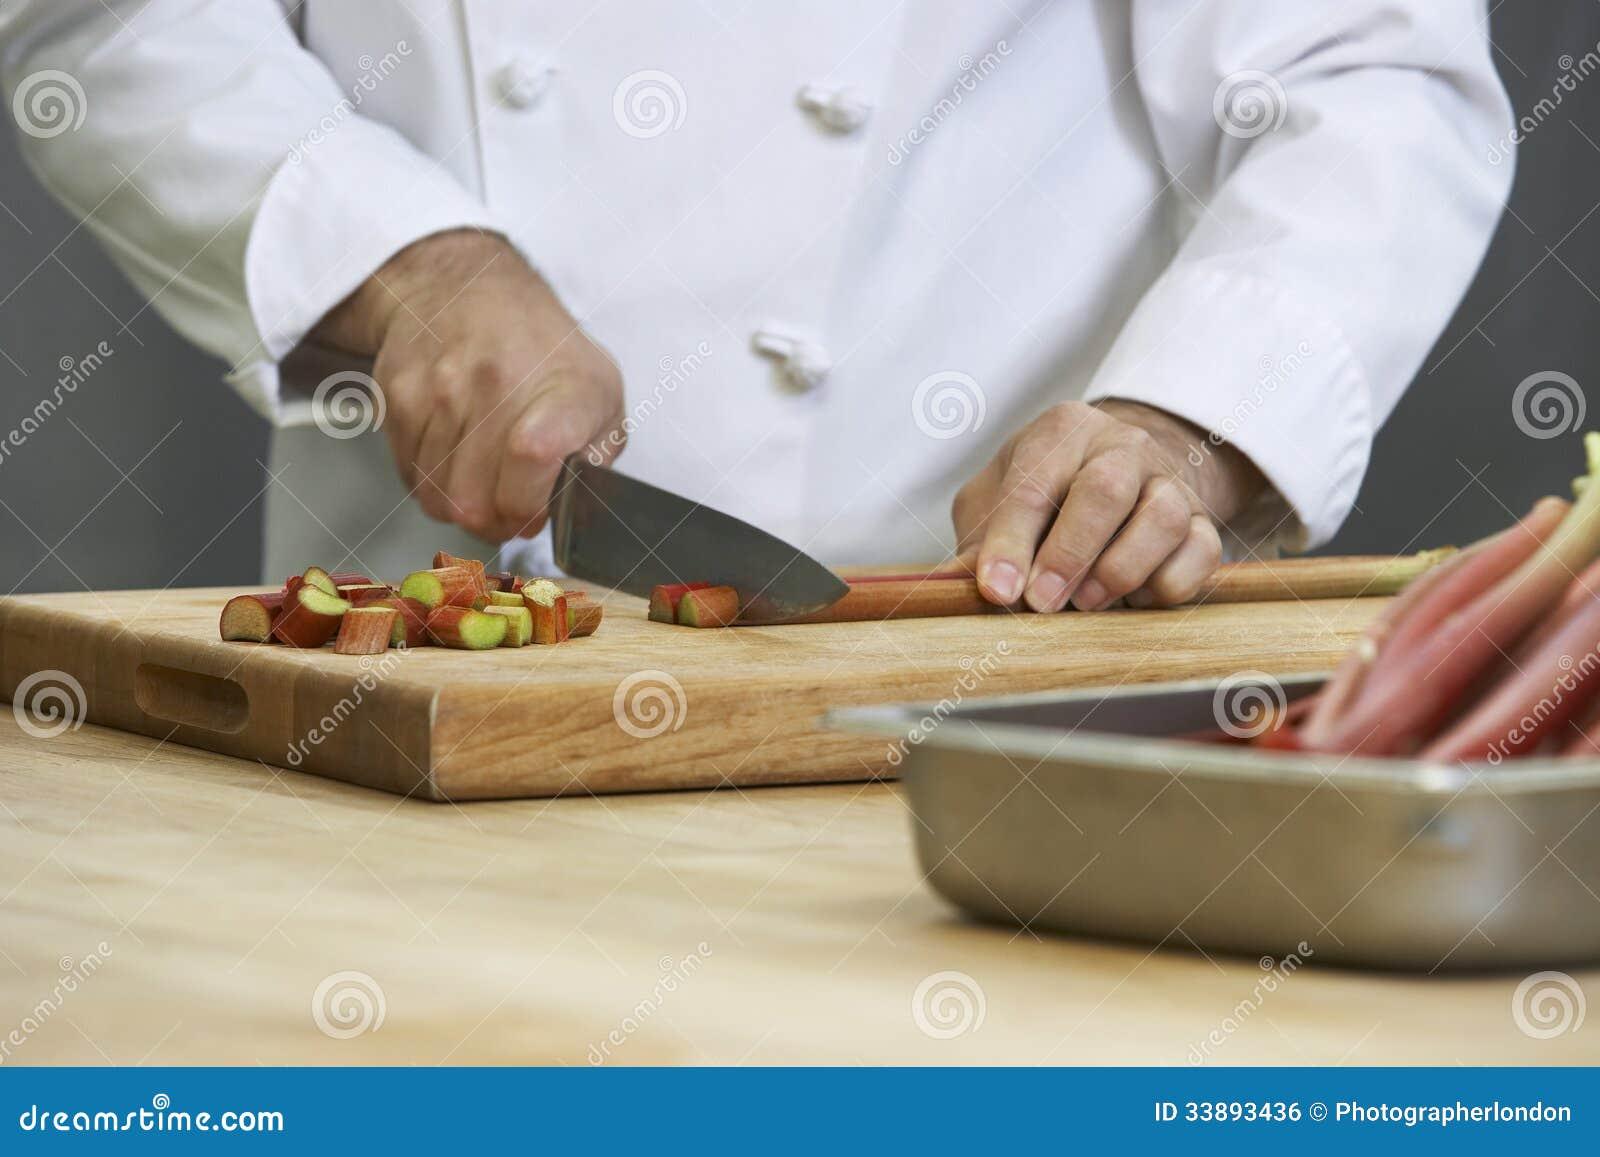 Kock Chopping Rhubarb